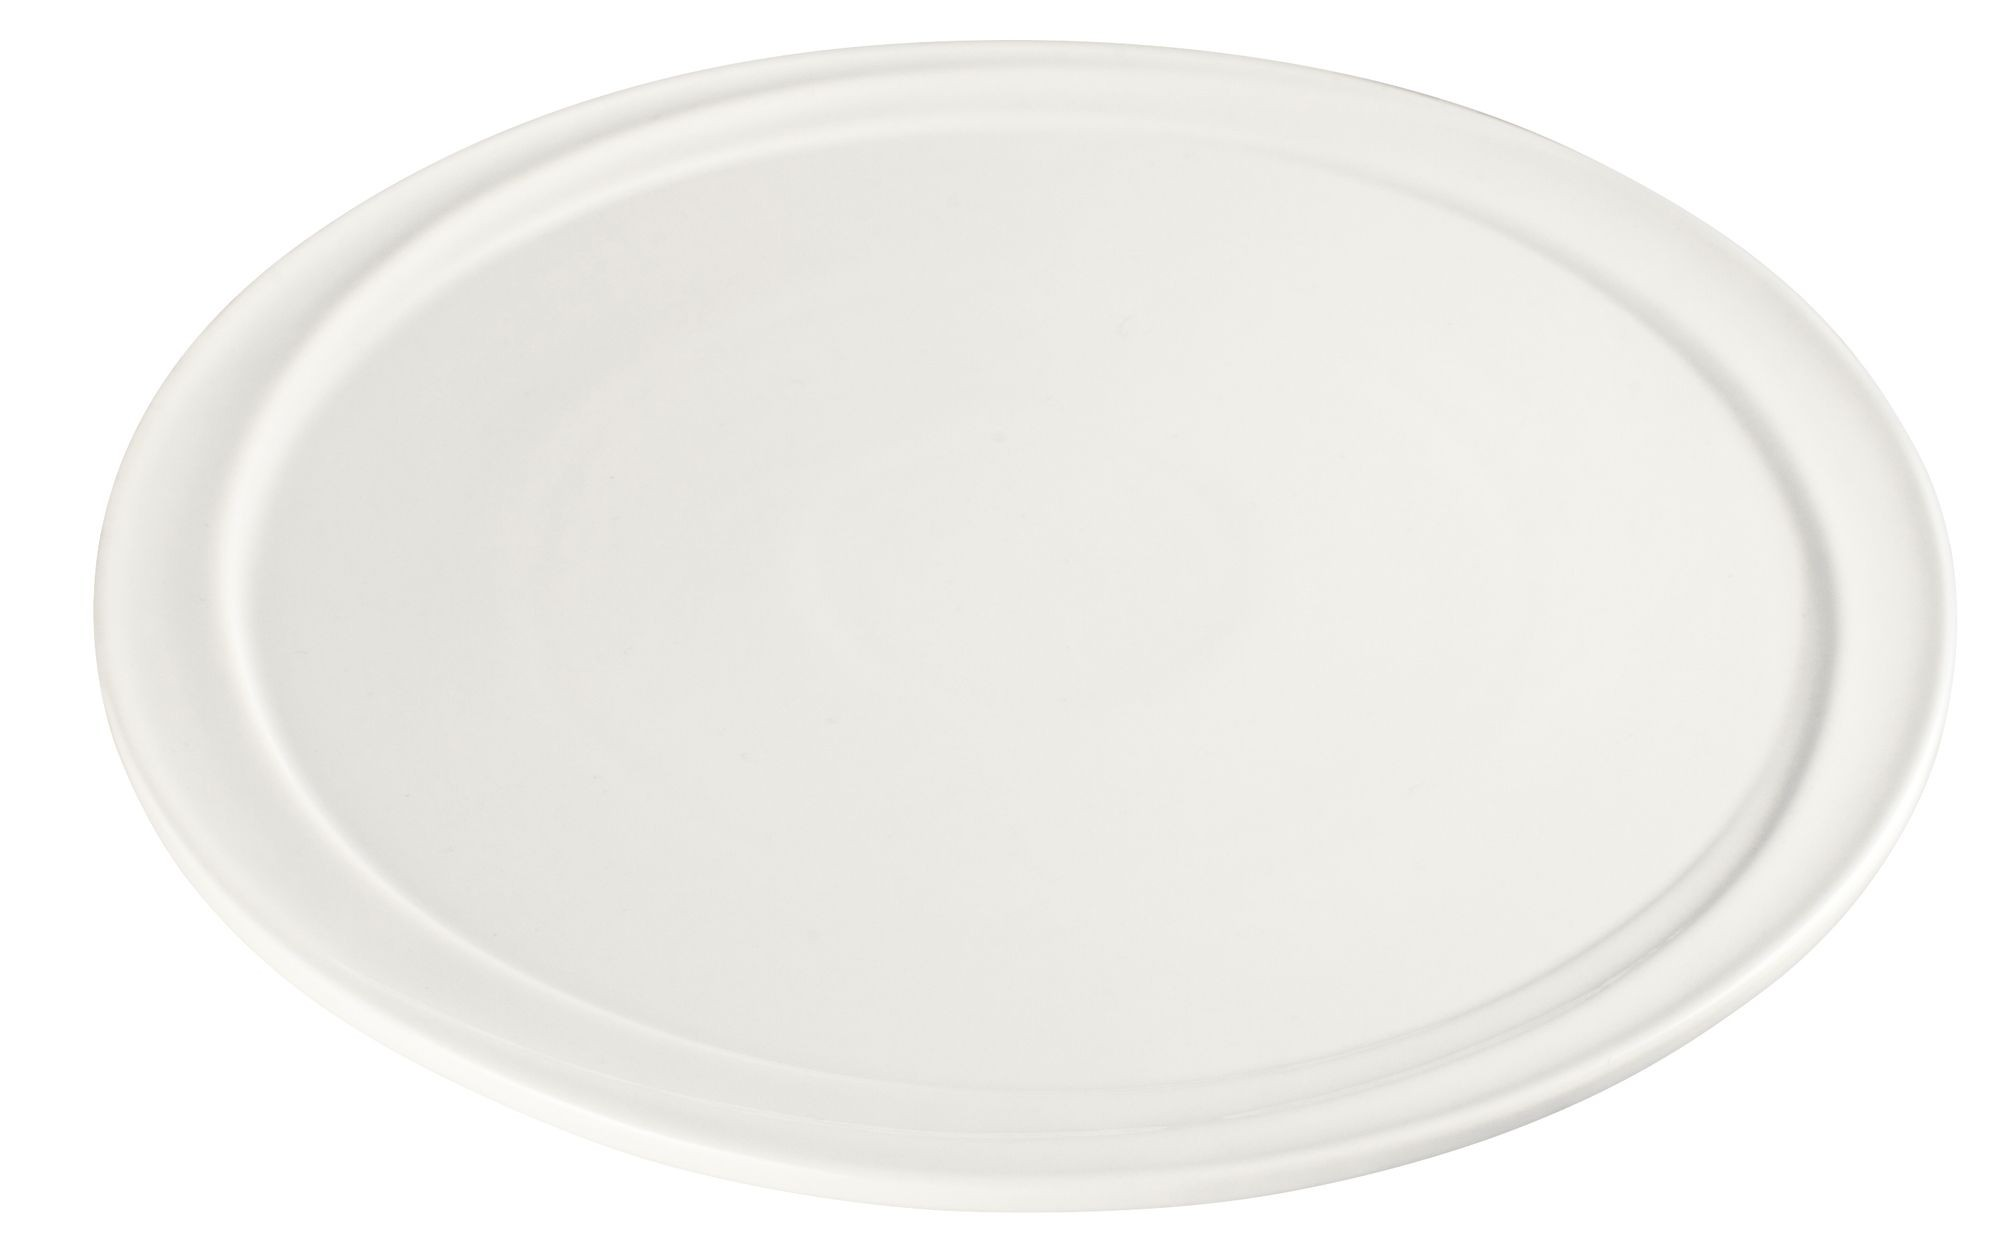 "Winco WDP007-101 Mazzari Creamy White Porcelain Round Platter 10"""